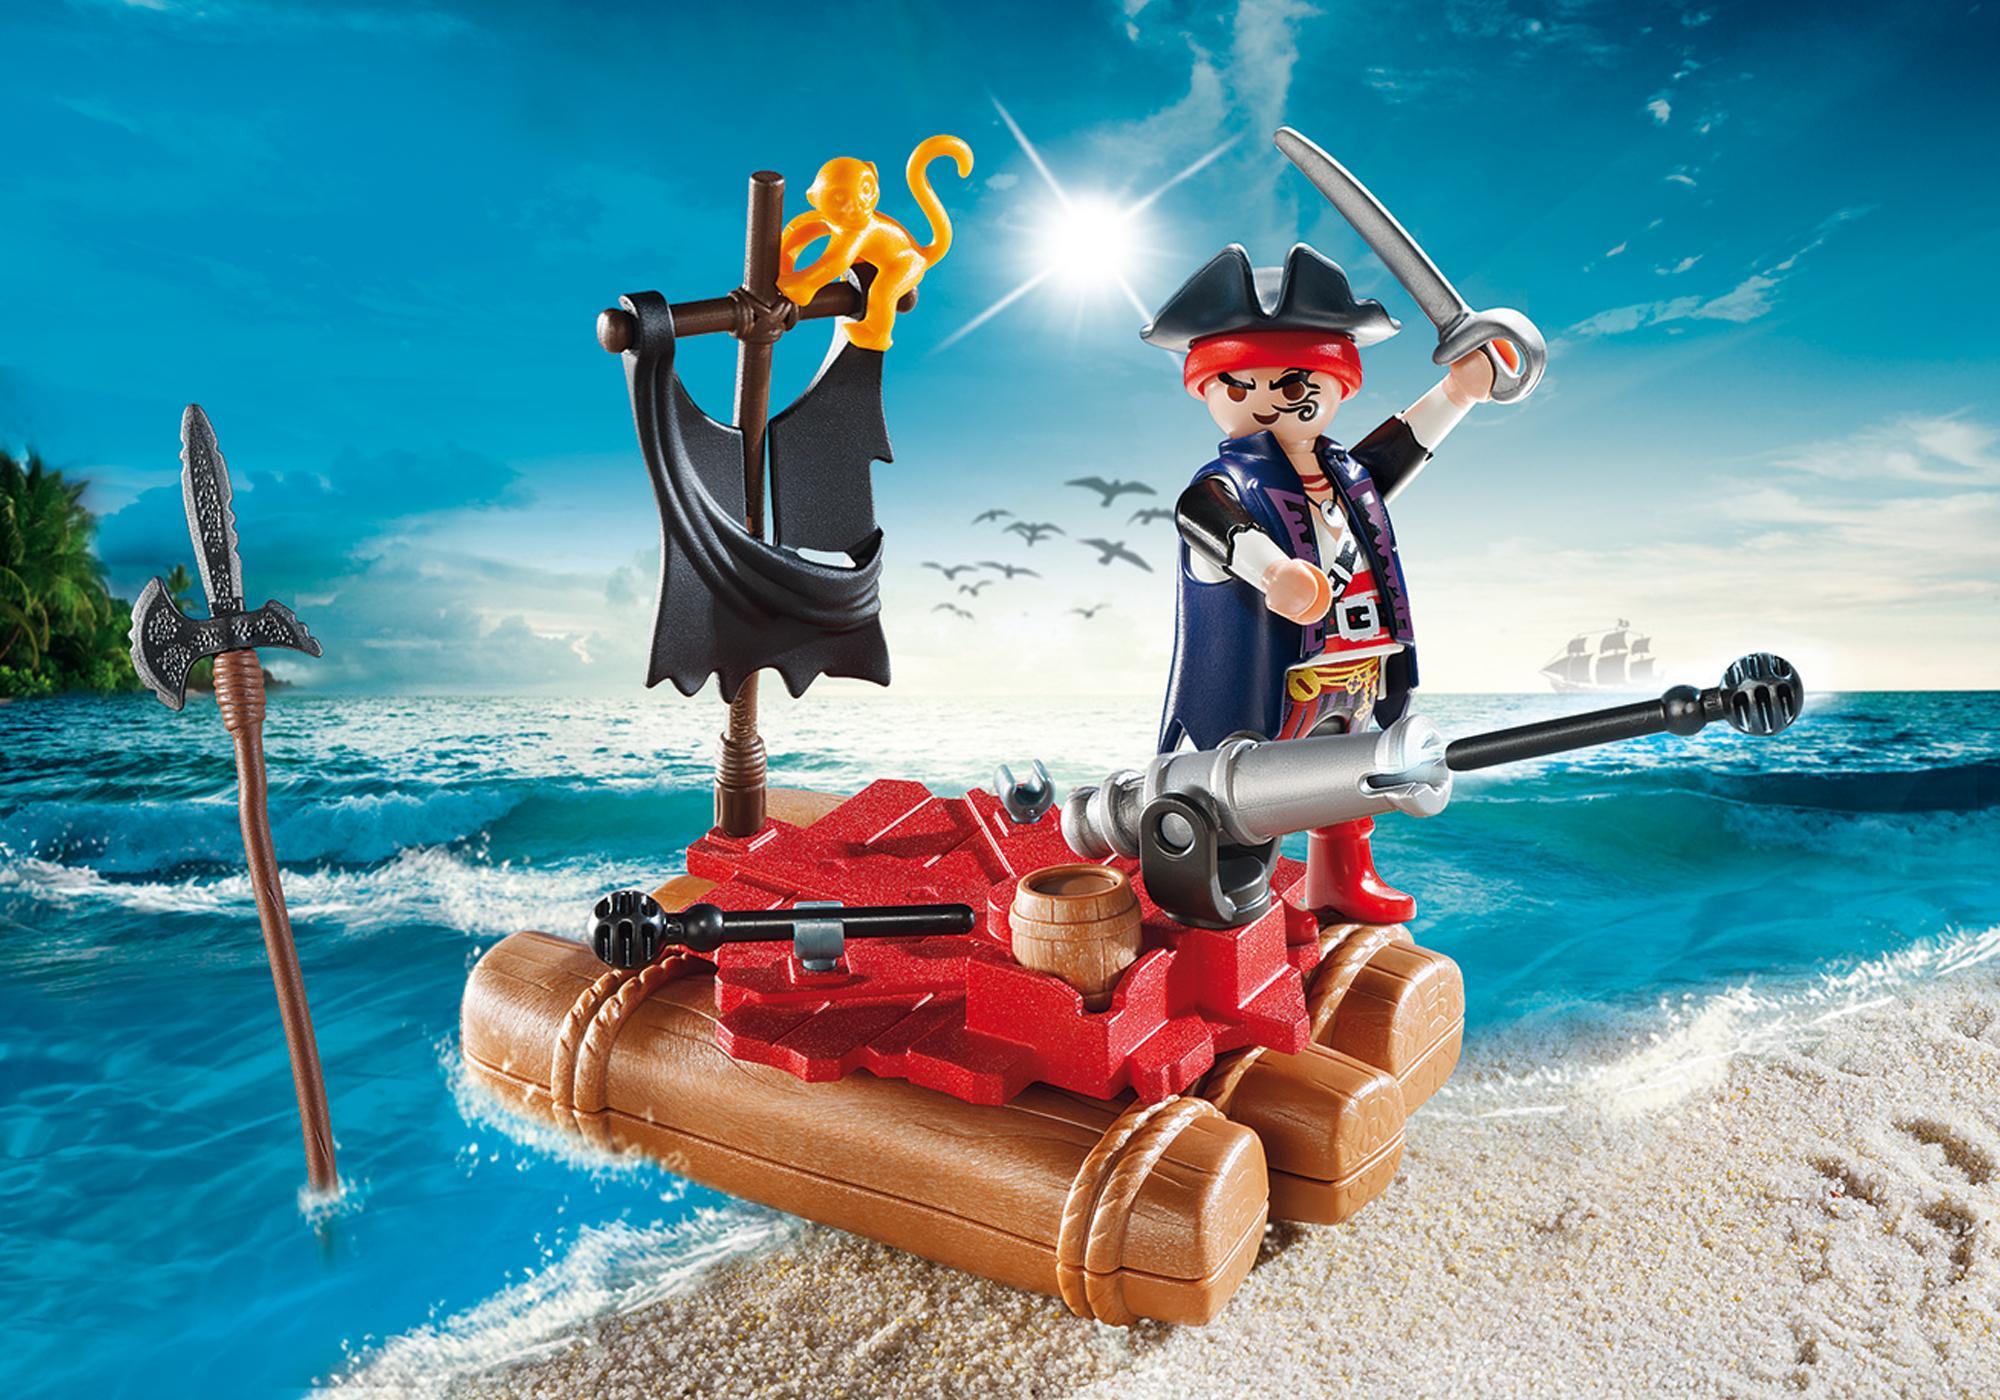 http://media.playmobil.com/i/playmobil/5655_product_detail/Pirate Raft Carry Case